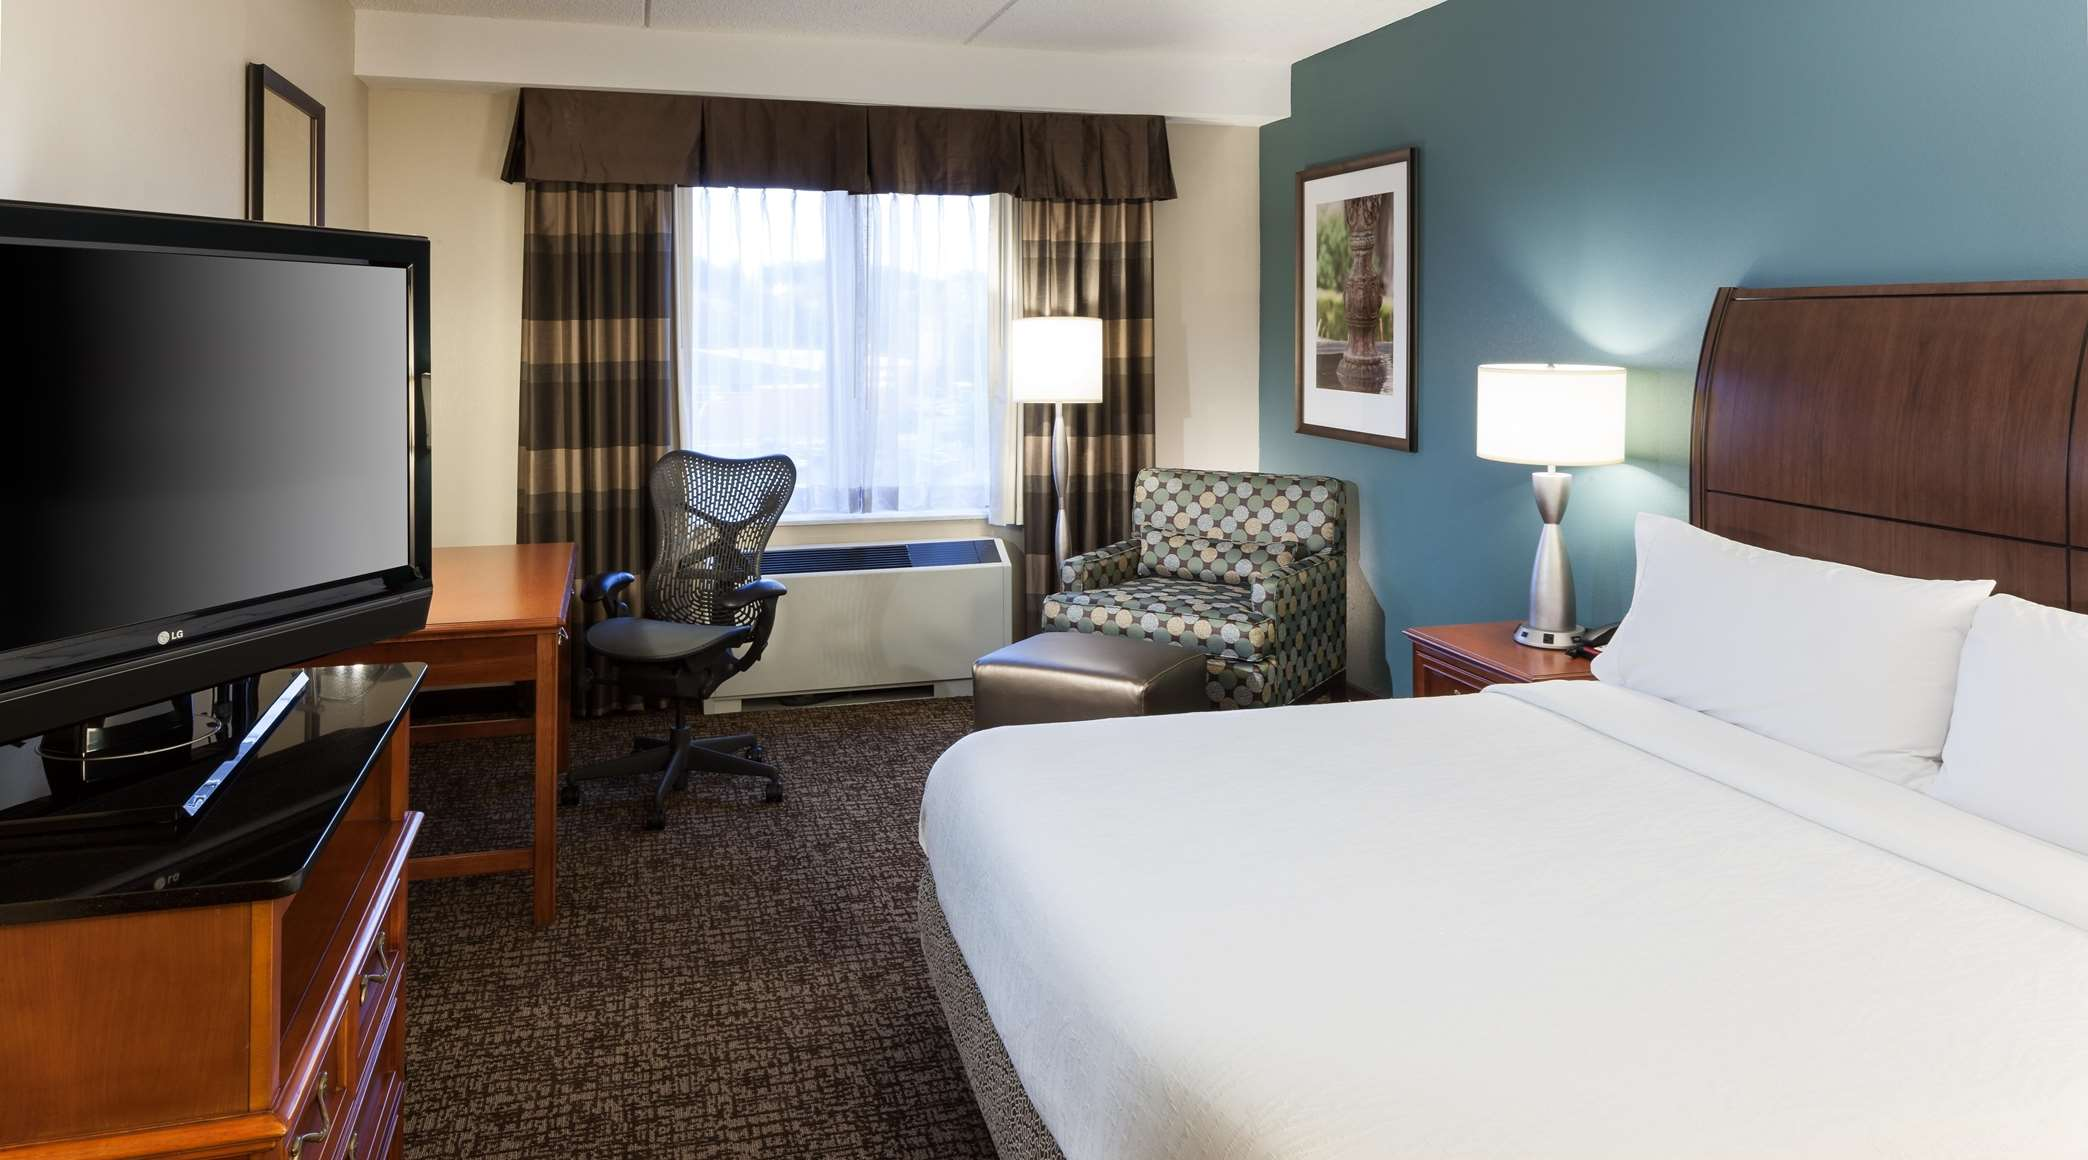 Hilton Garden Inn Rockaway image 18